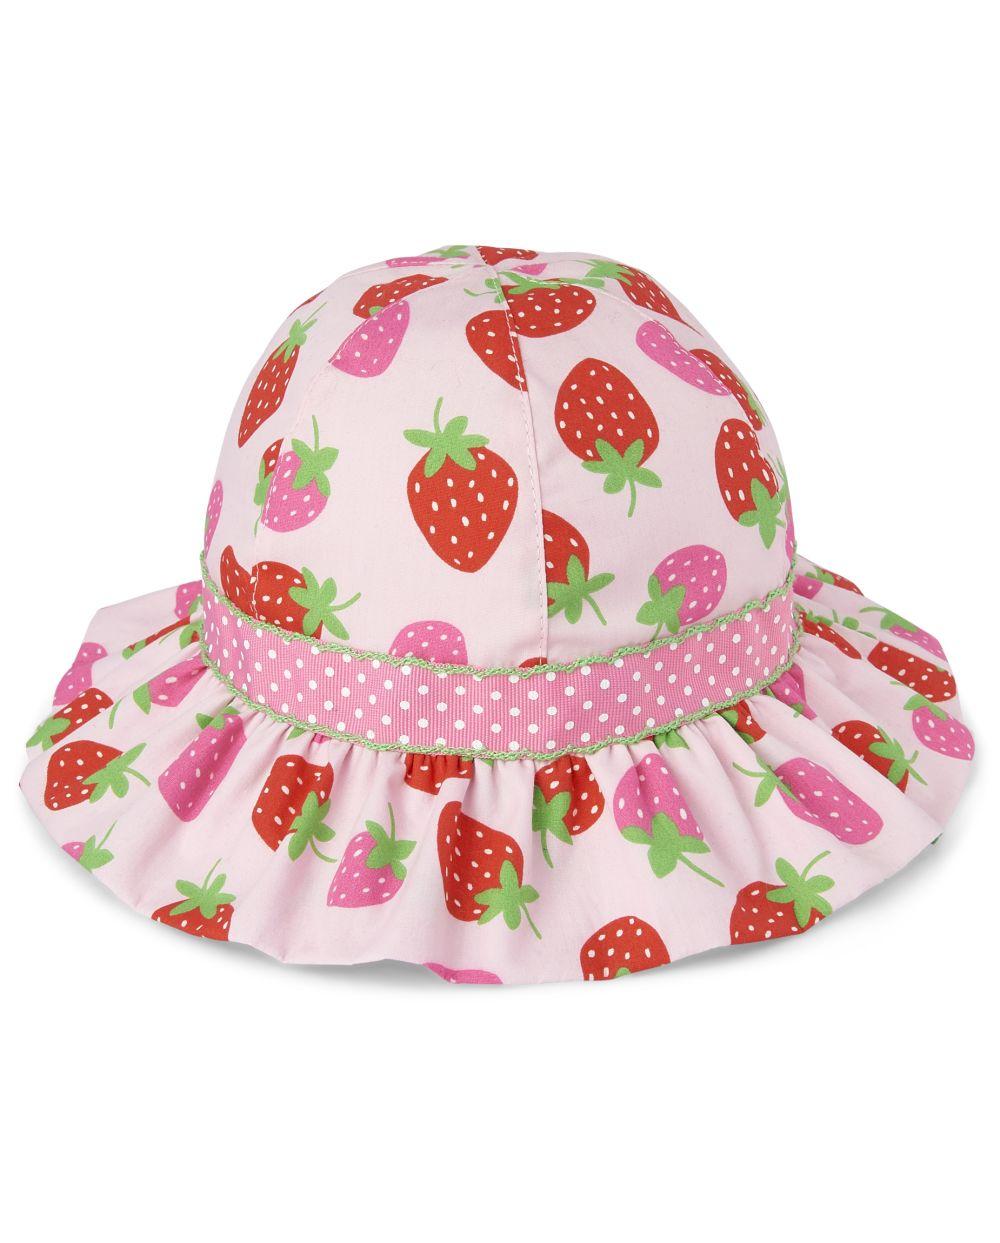 Girls Bucket Hat - Strawberry Patch